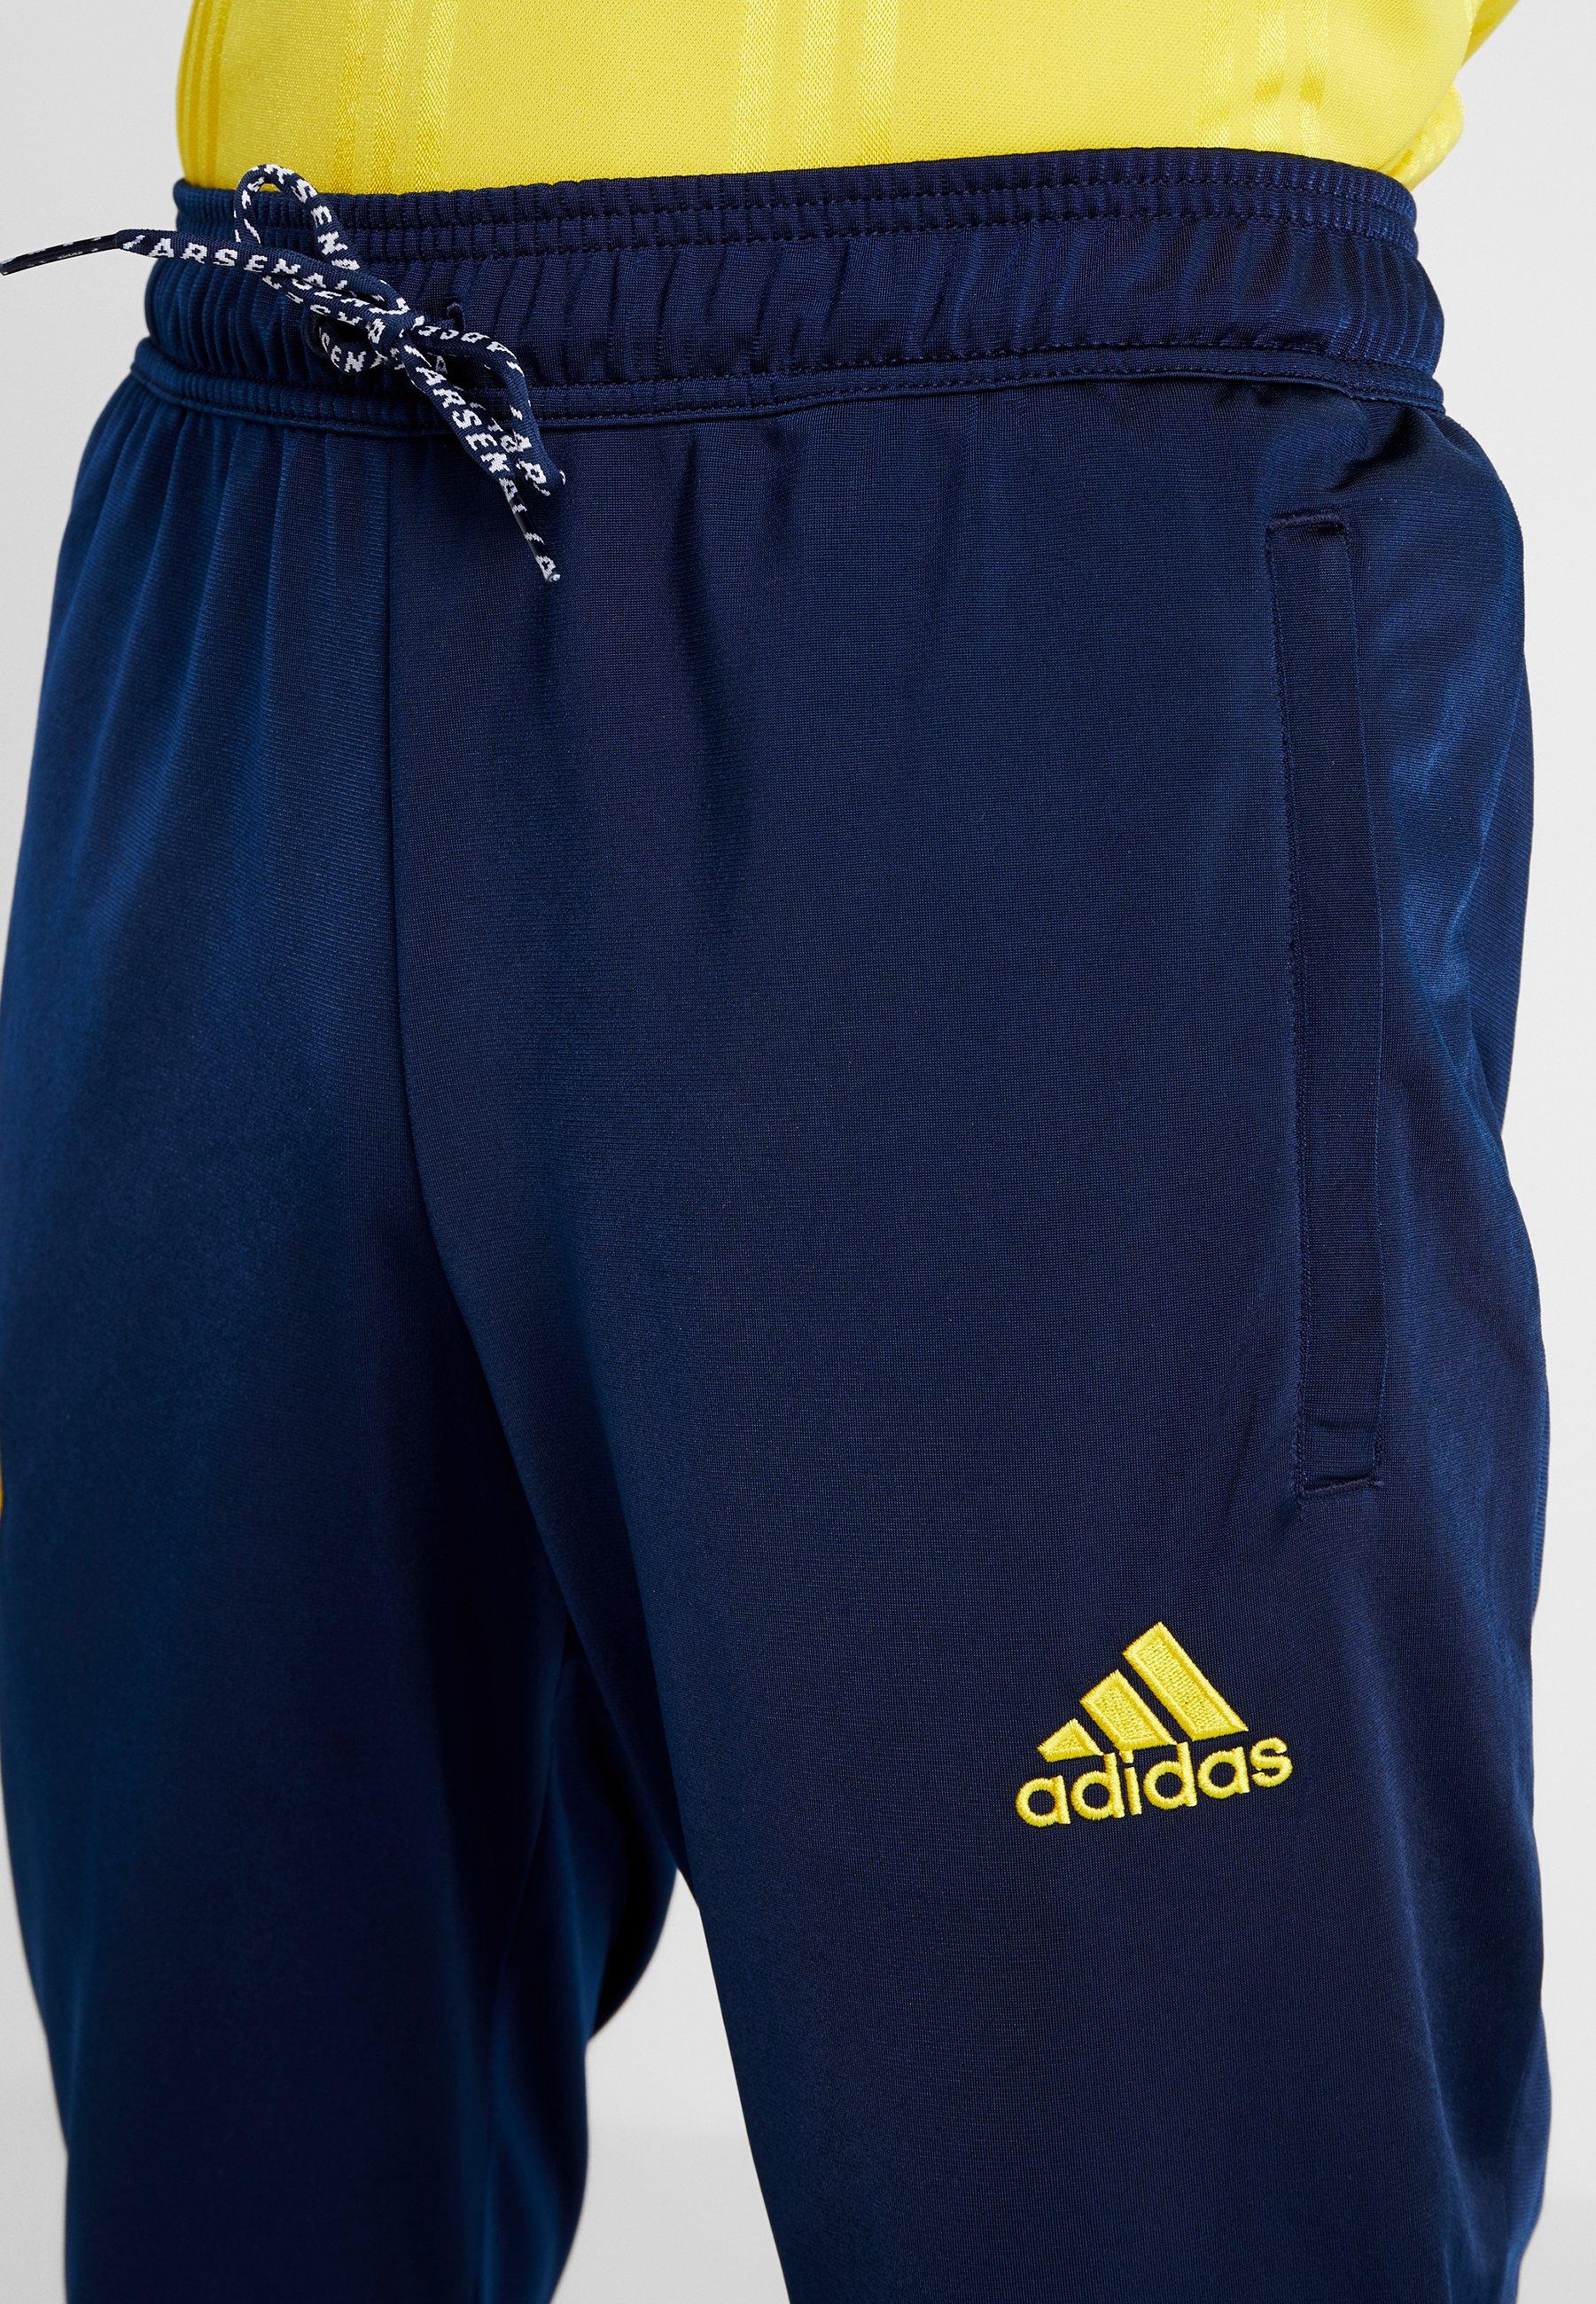 adidas Performance ARSENAL FC ICONS Jogginghose dark